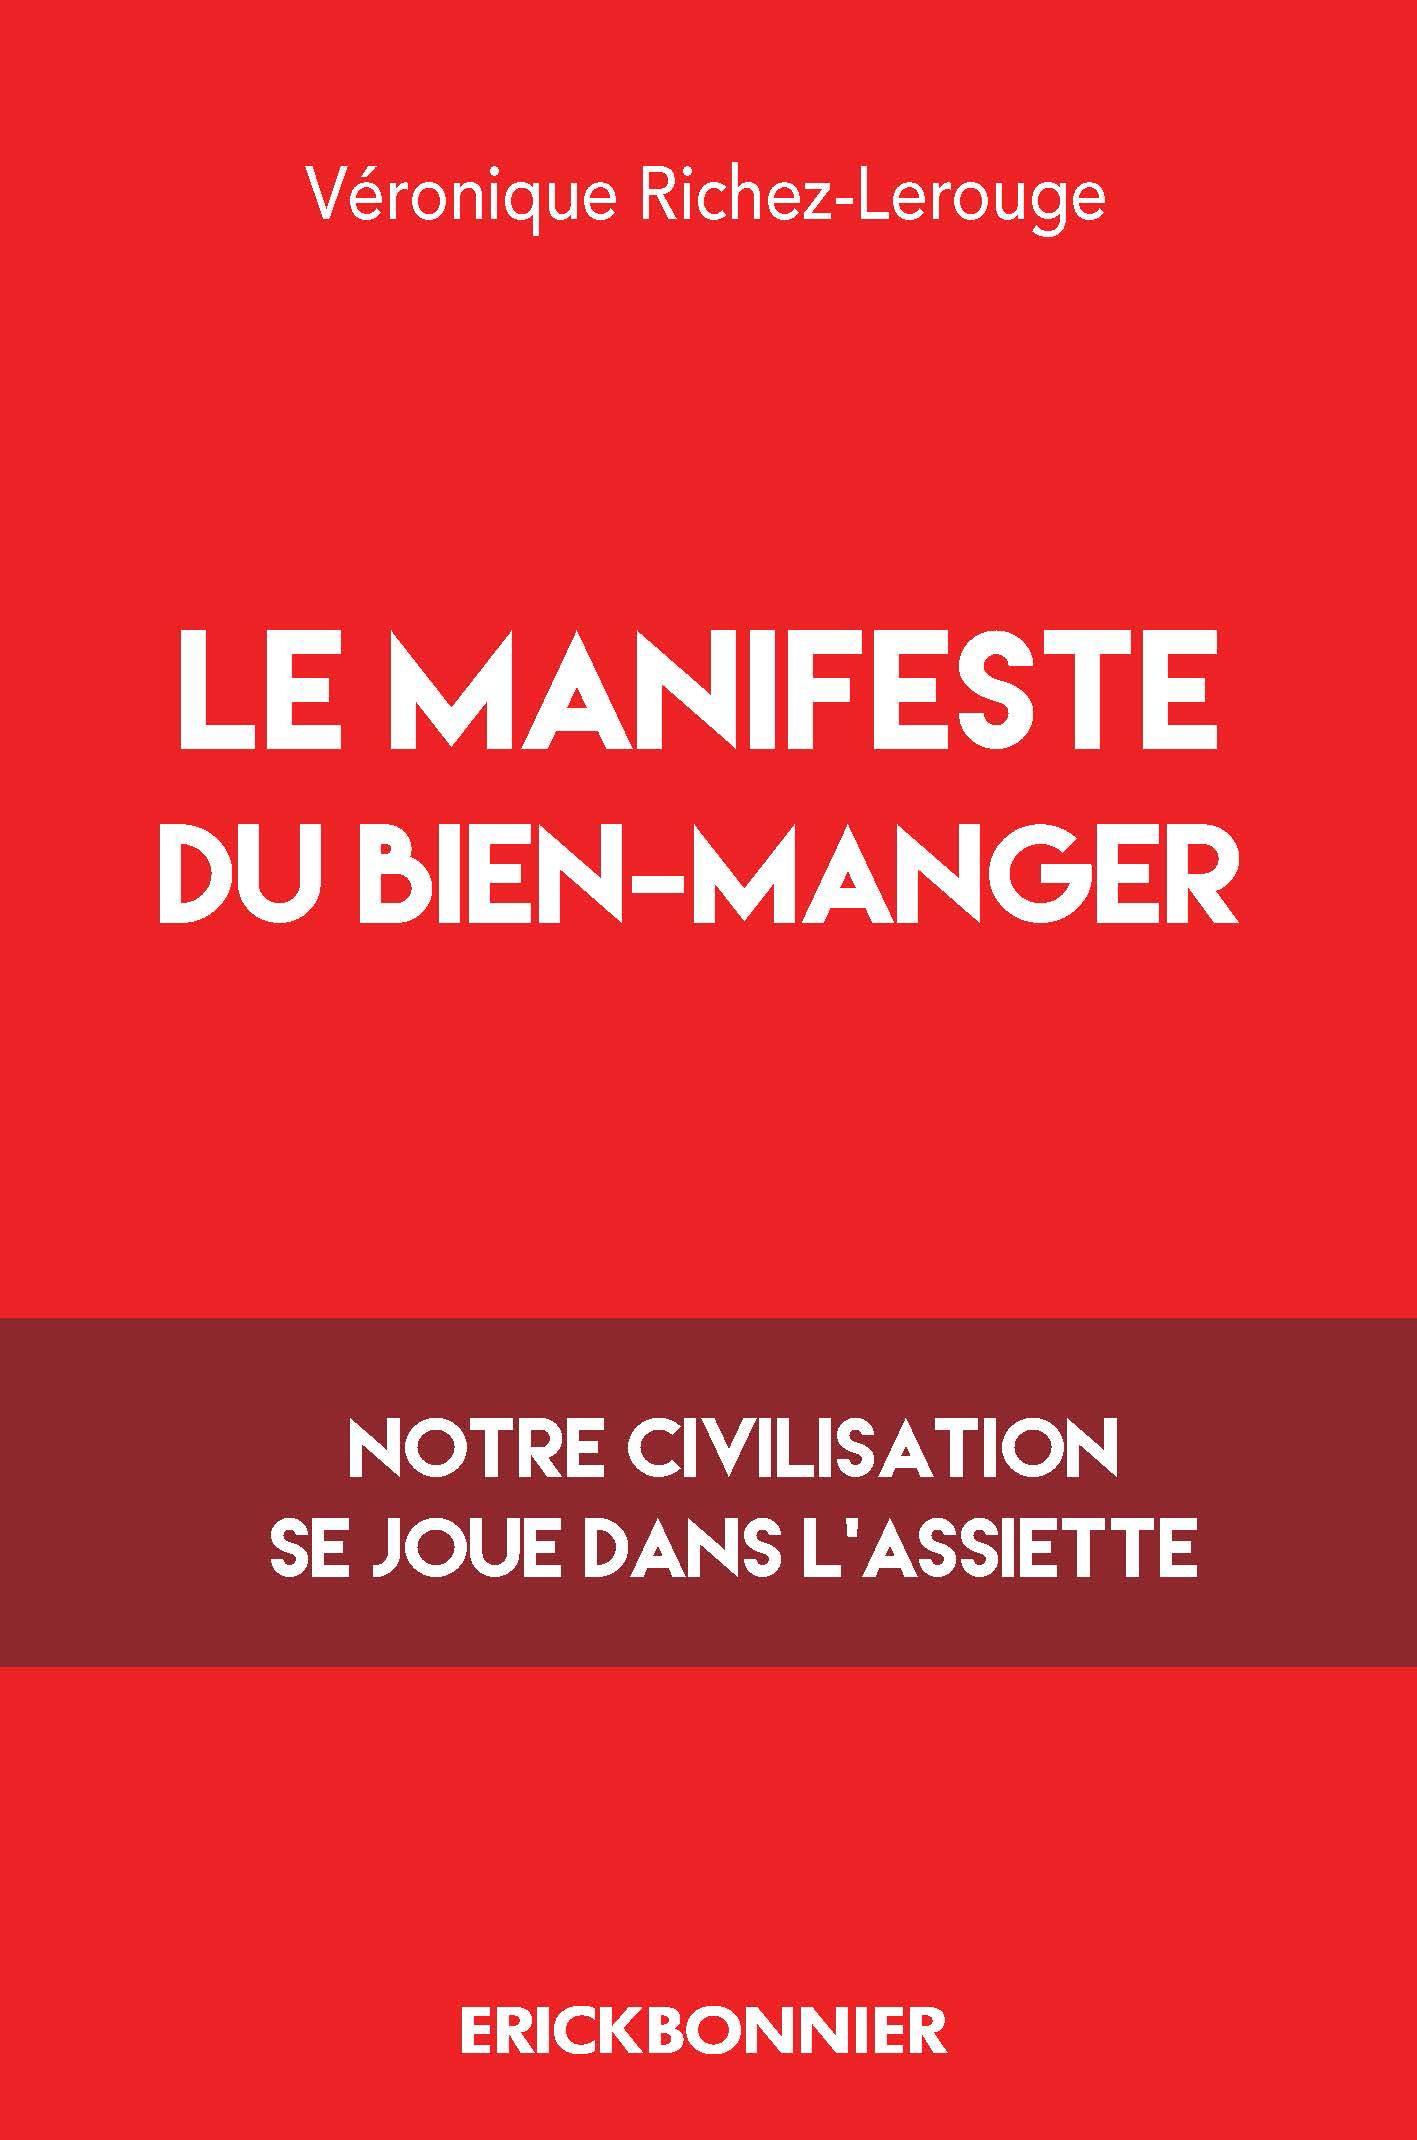 LE MANISFESTE DU BIEN-MANGER